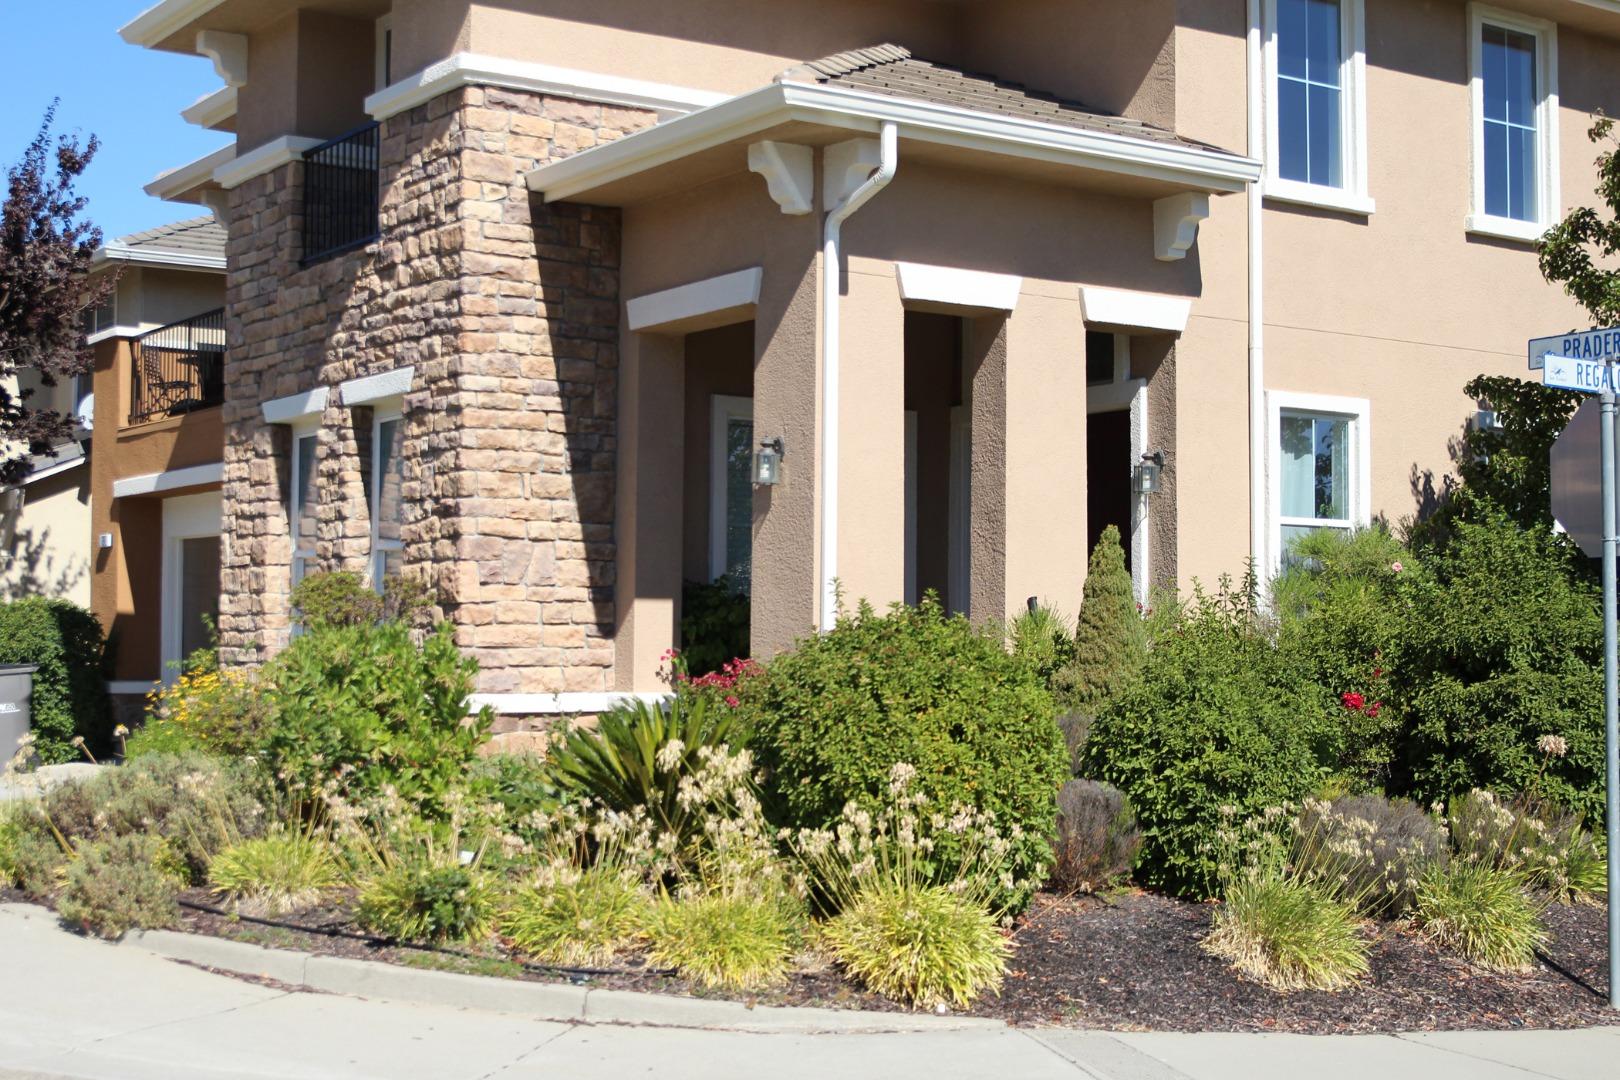 Water Conservation Rebate Program In Pleasanton Livermore